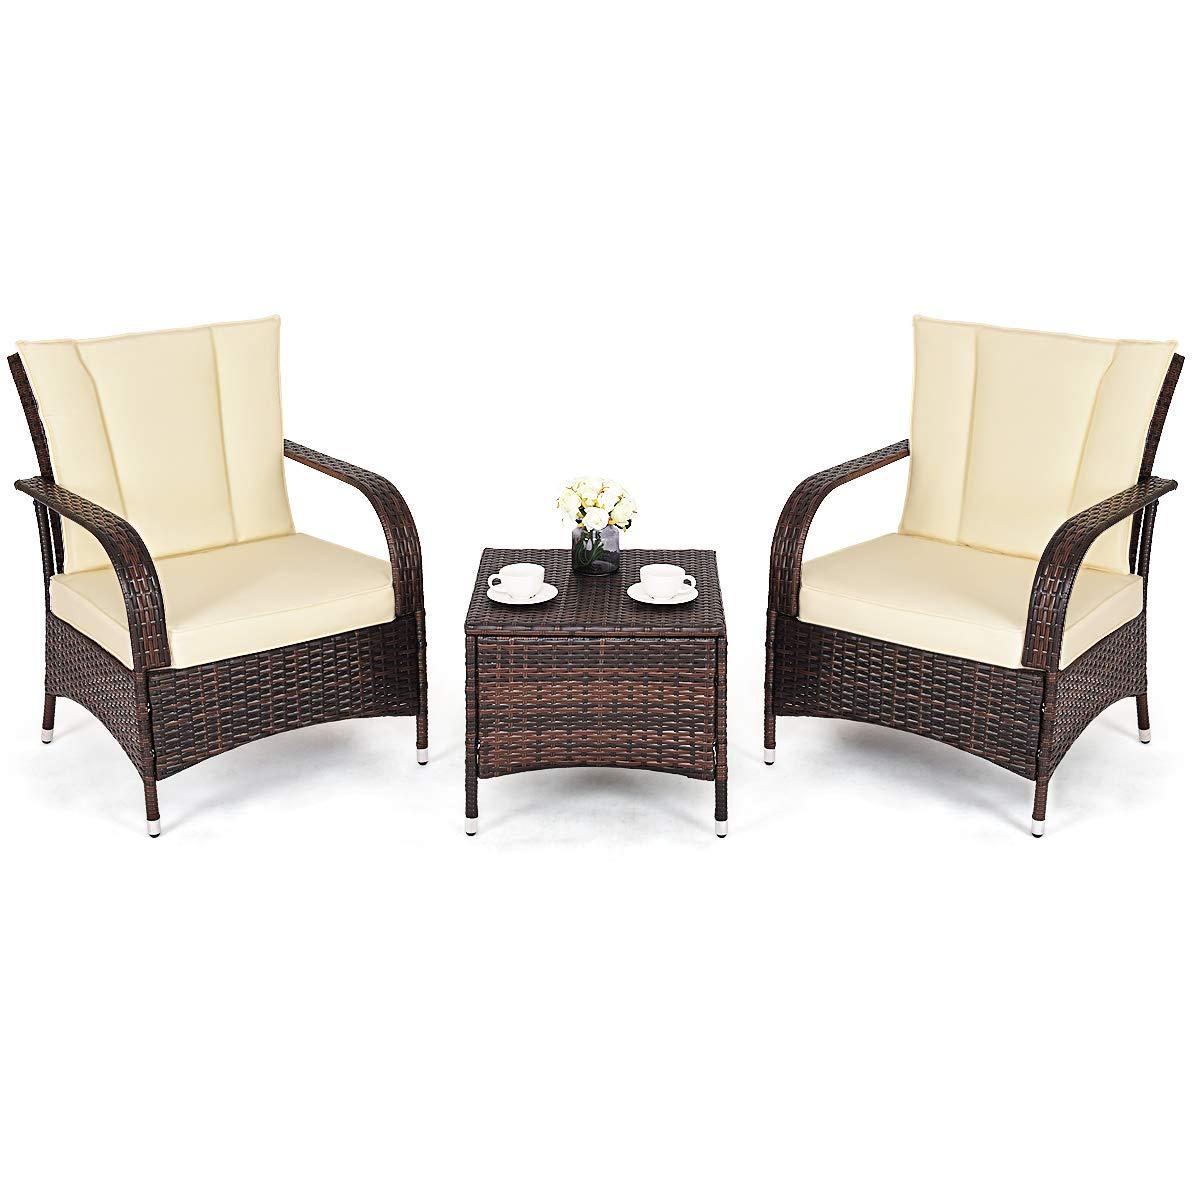 Tangkula 3 Piece Patio Furniture Set Wicker Rattan Outdoor Patio Conversation Set